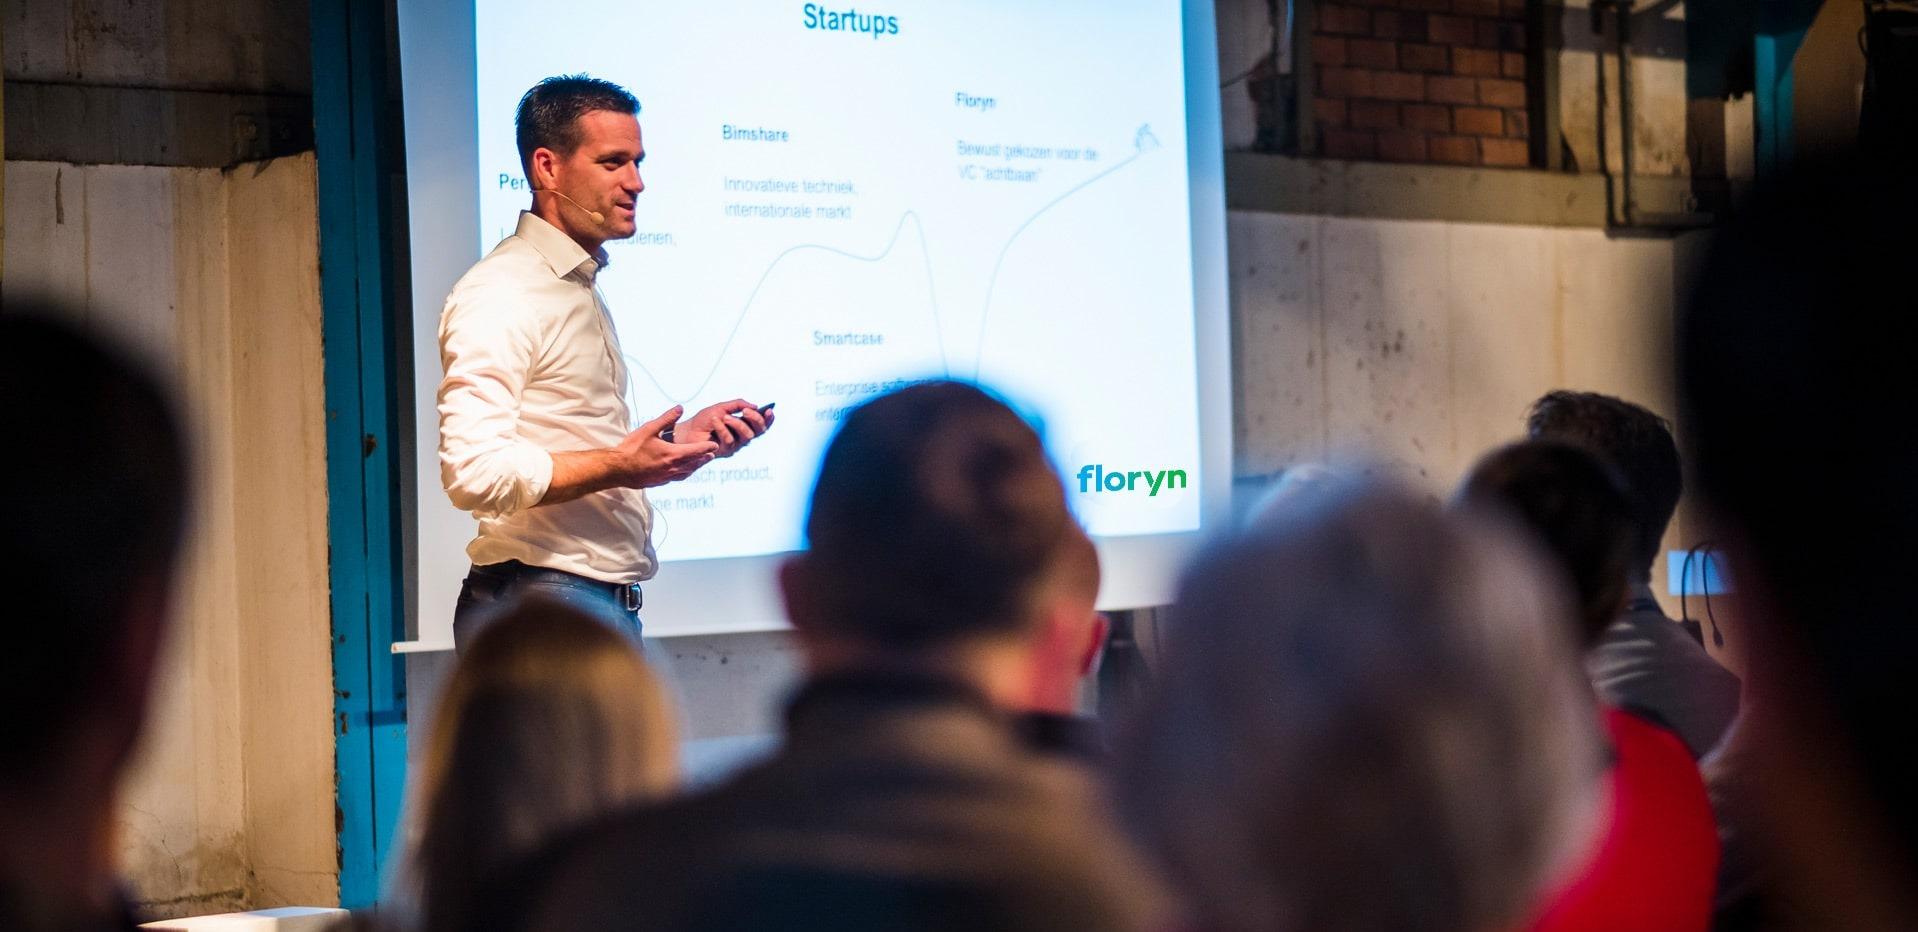 Fintech Floryn serieus alternatief voor MKB-krediet